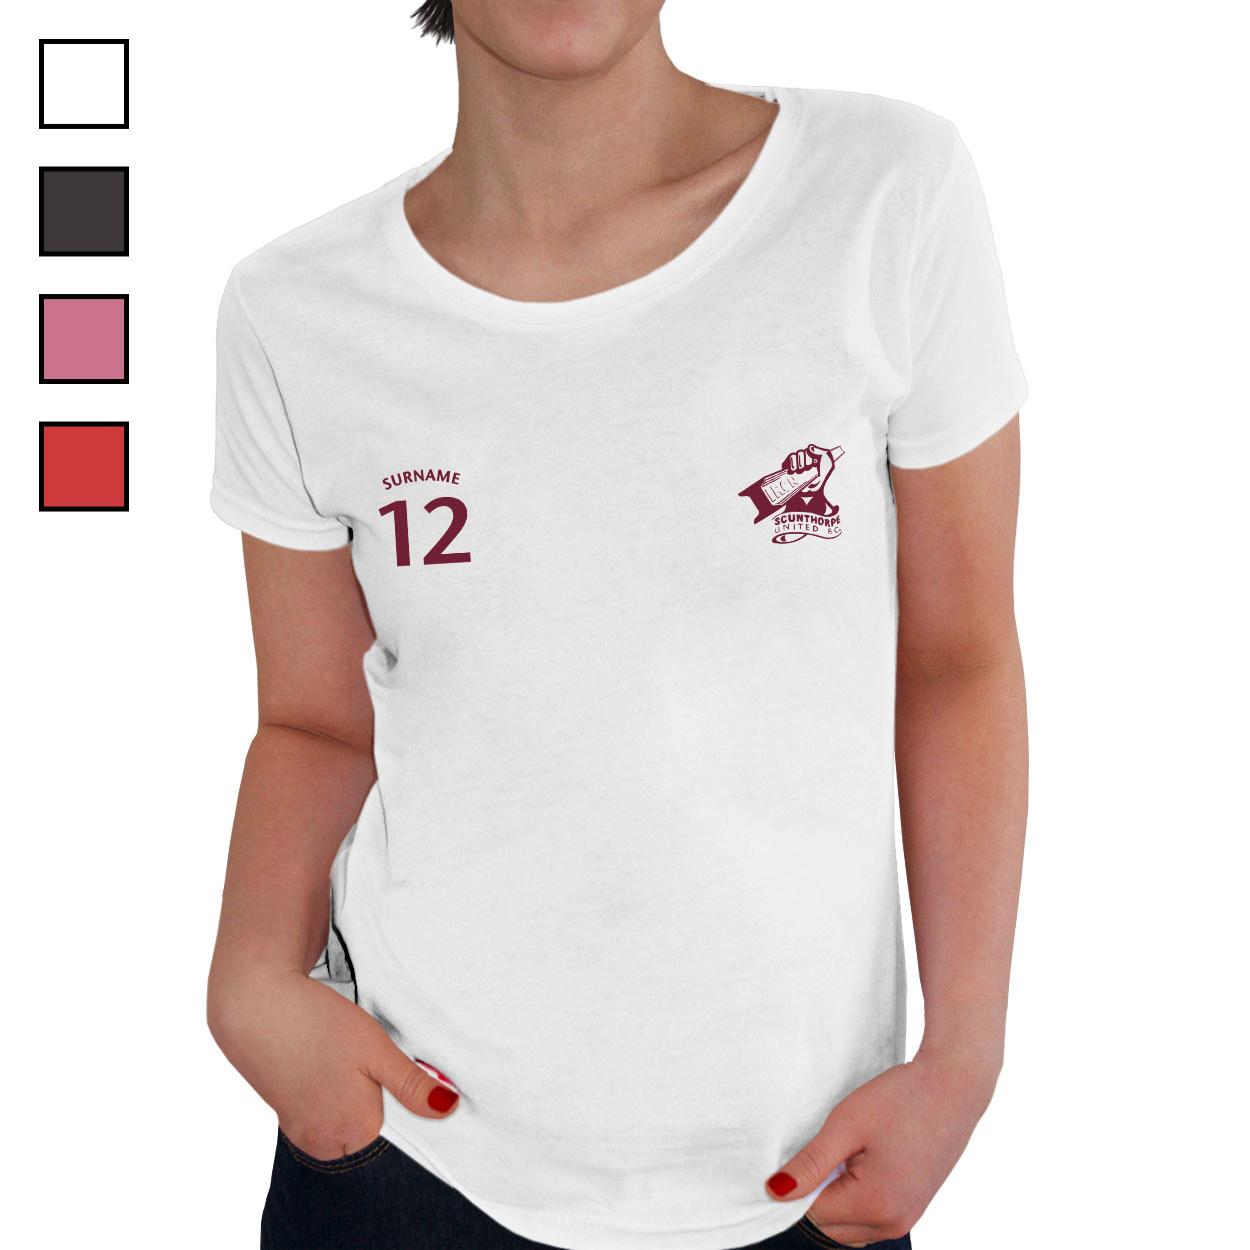 Scunthorpe United FC Ladies Sports T-Shirt